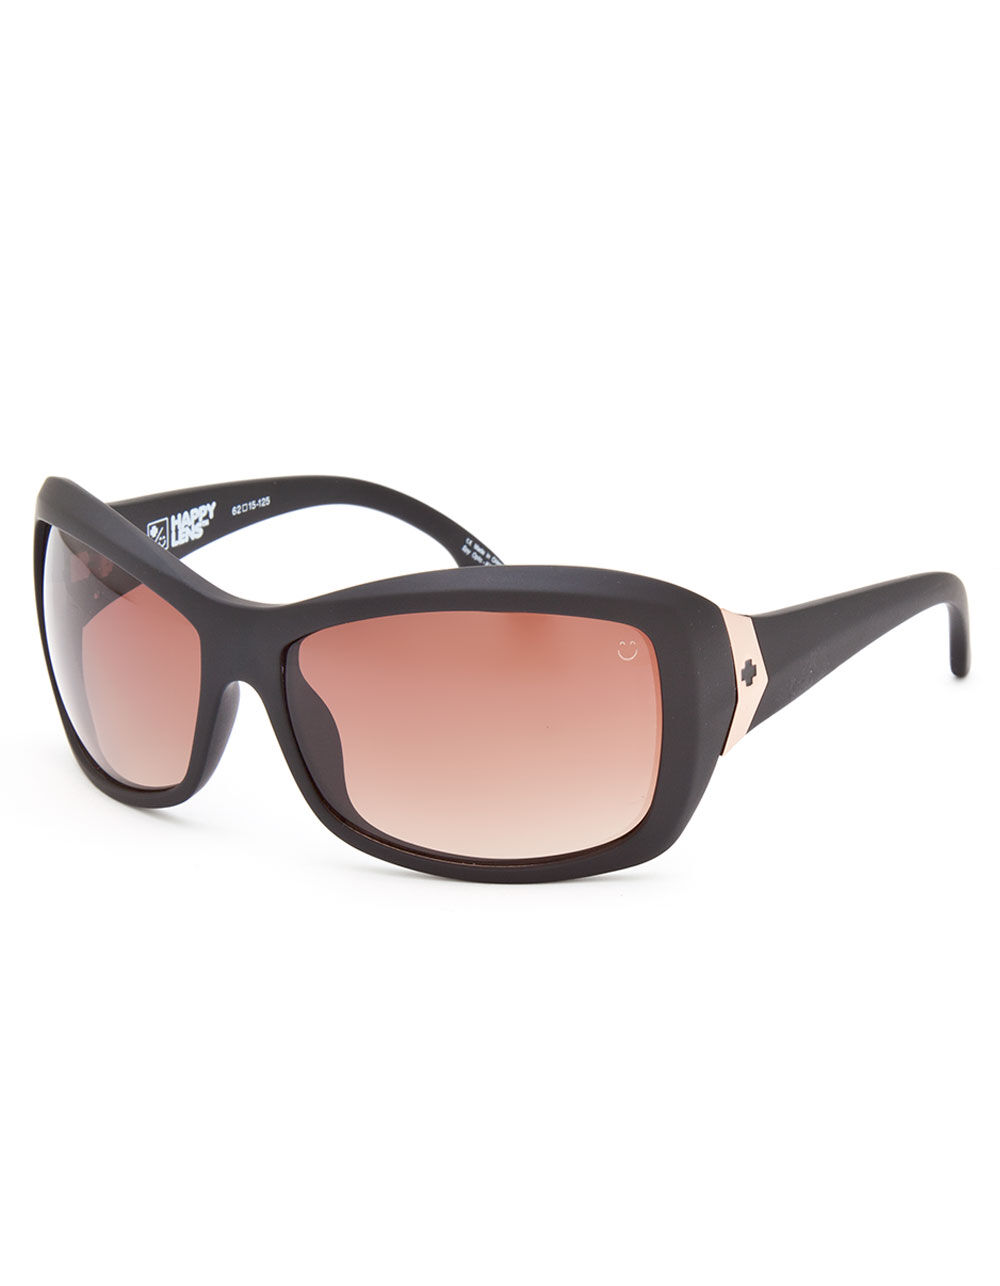 SPY Happy Lens Farrah Sunglasses